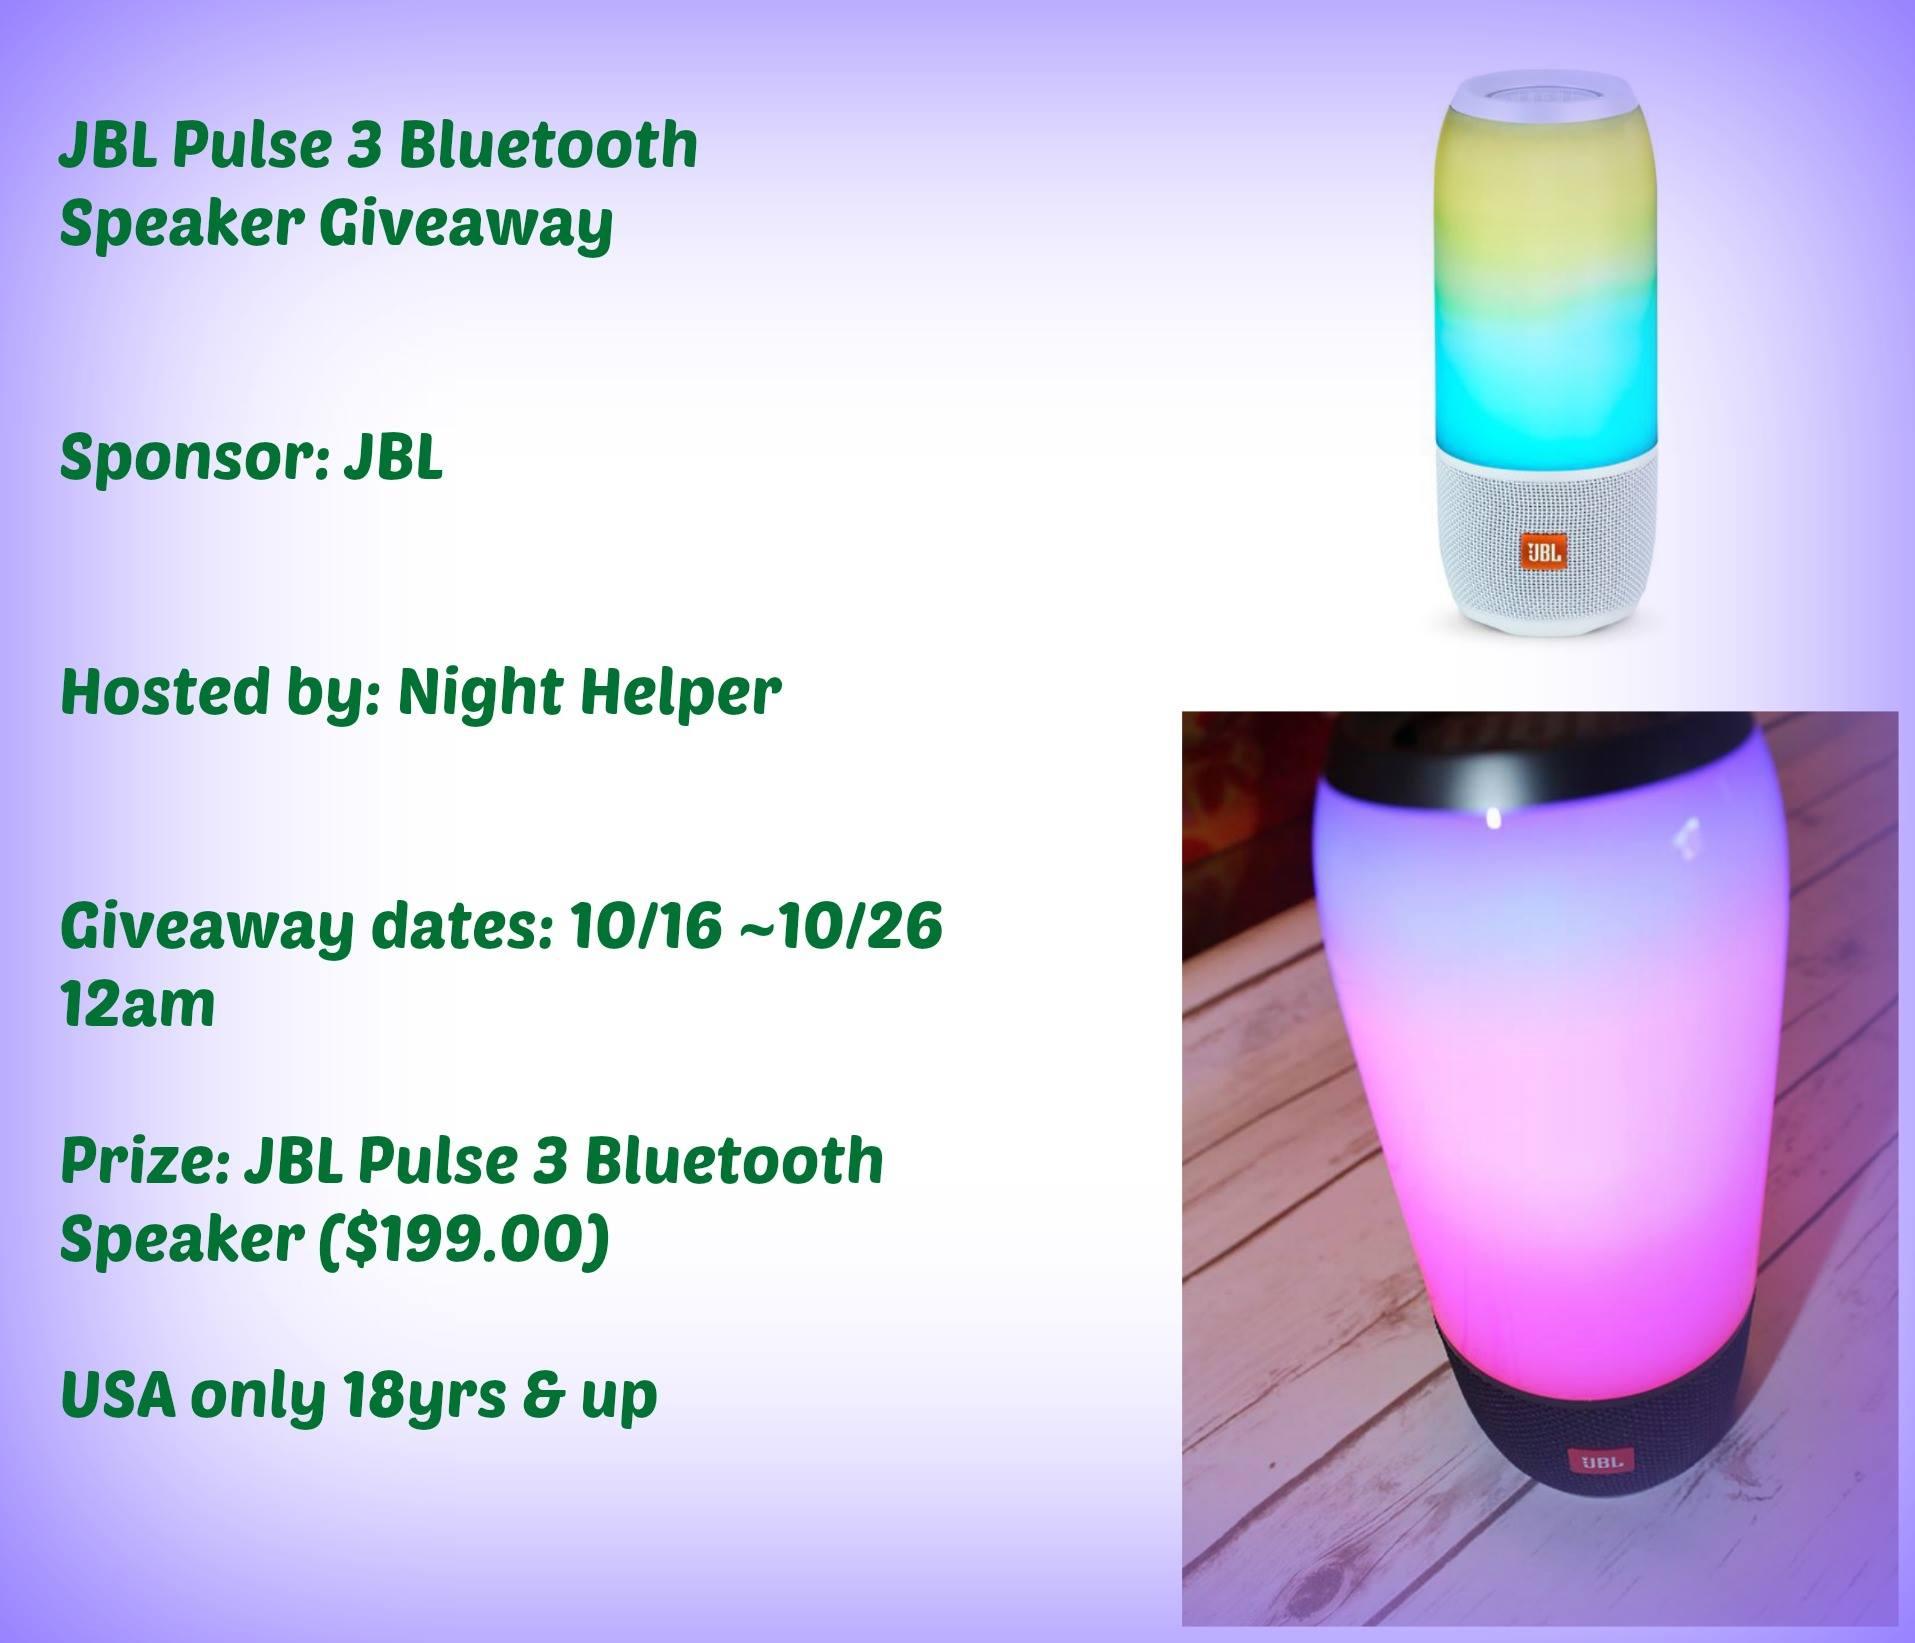 Jbl pulse 3 bluetooth speaker giveaway it 39 s free at last for Housse jbl pulse 3